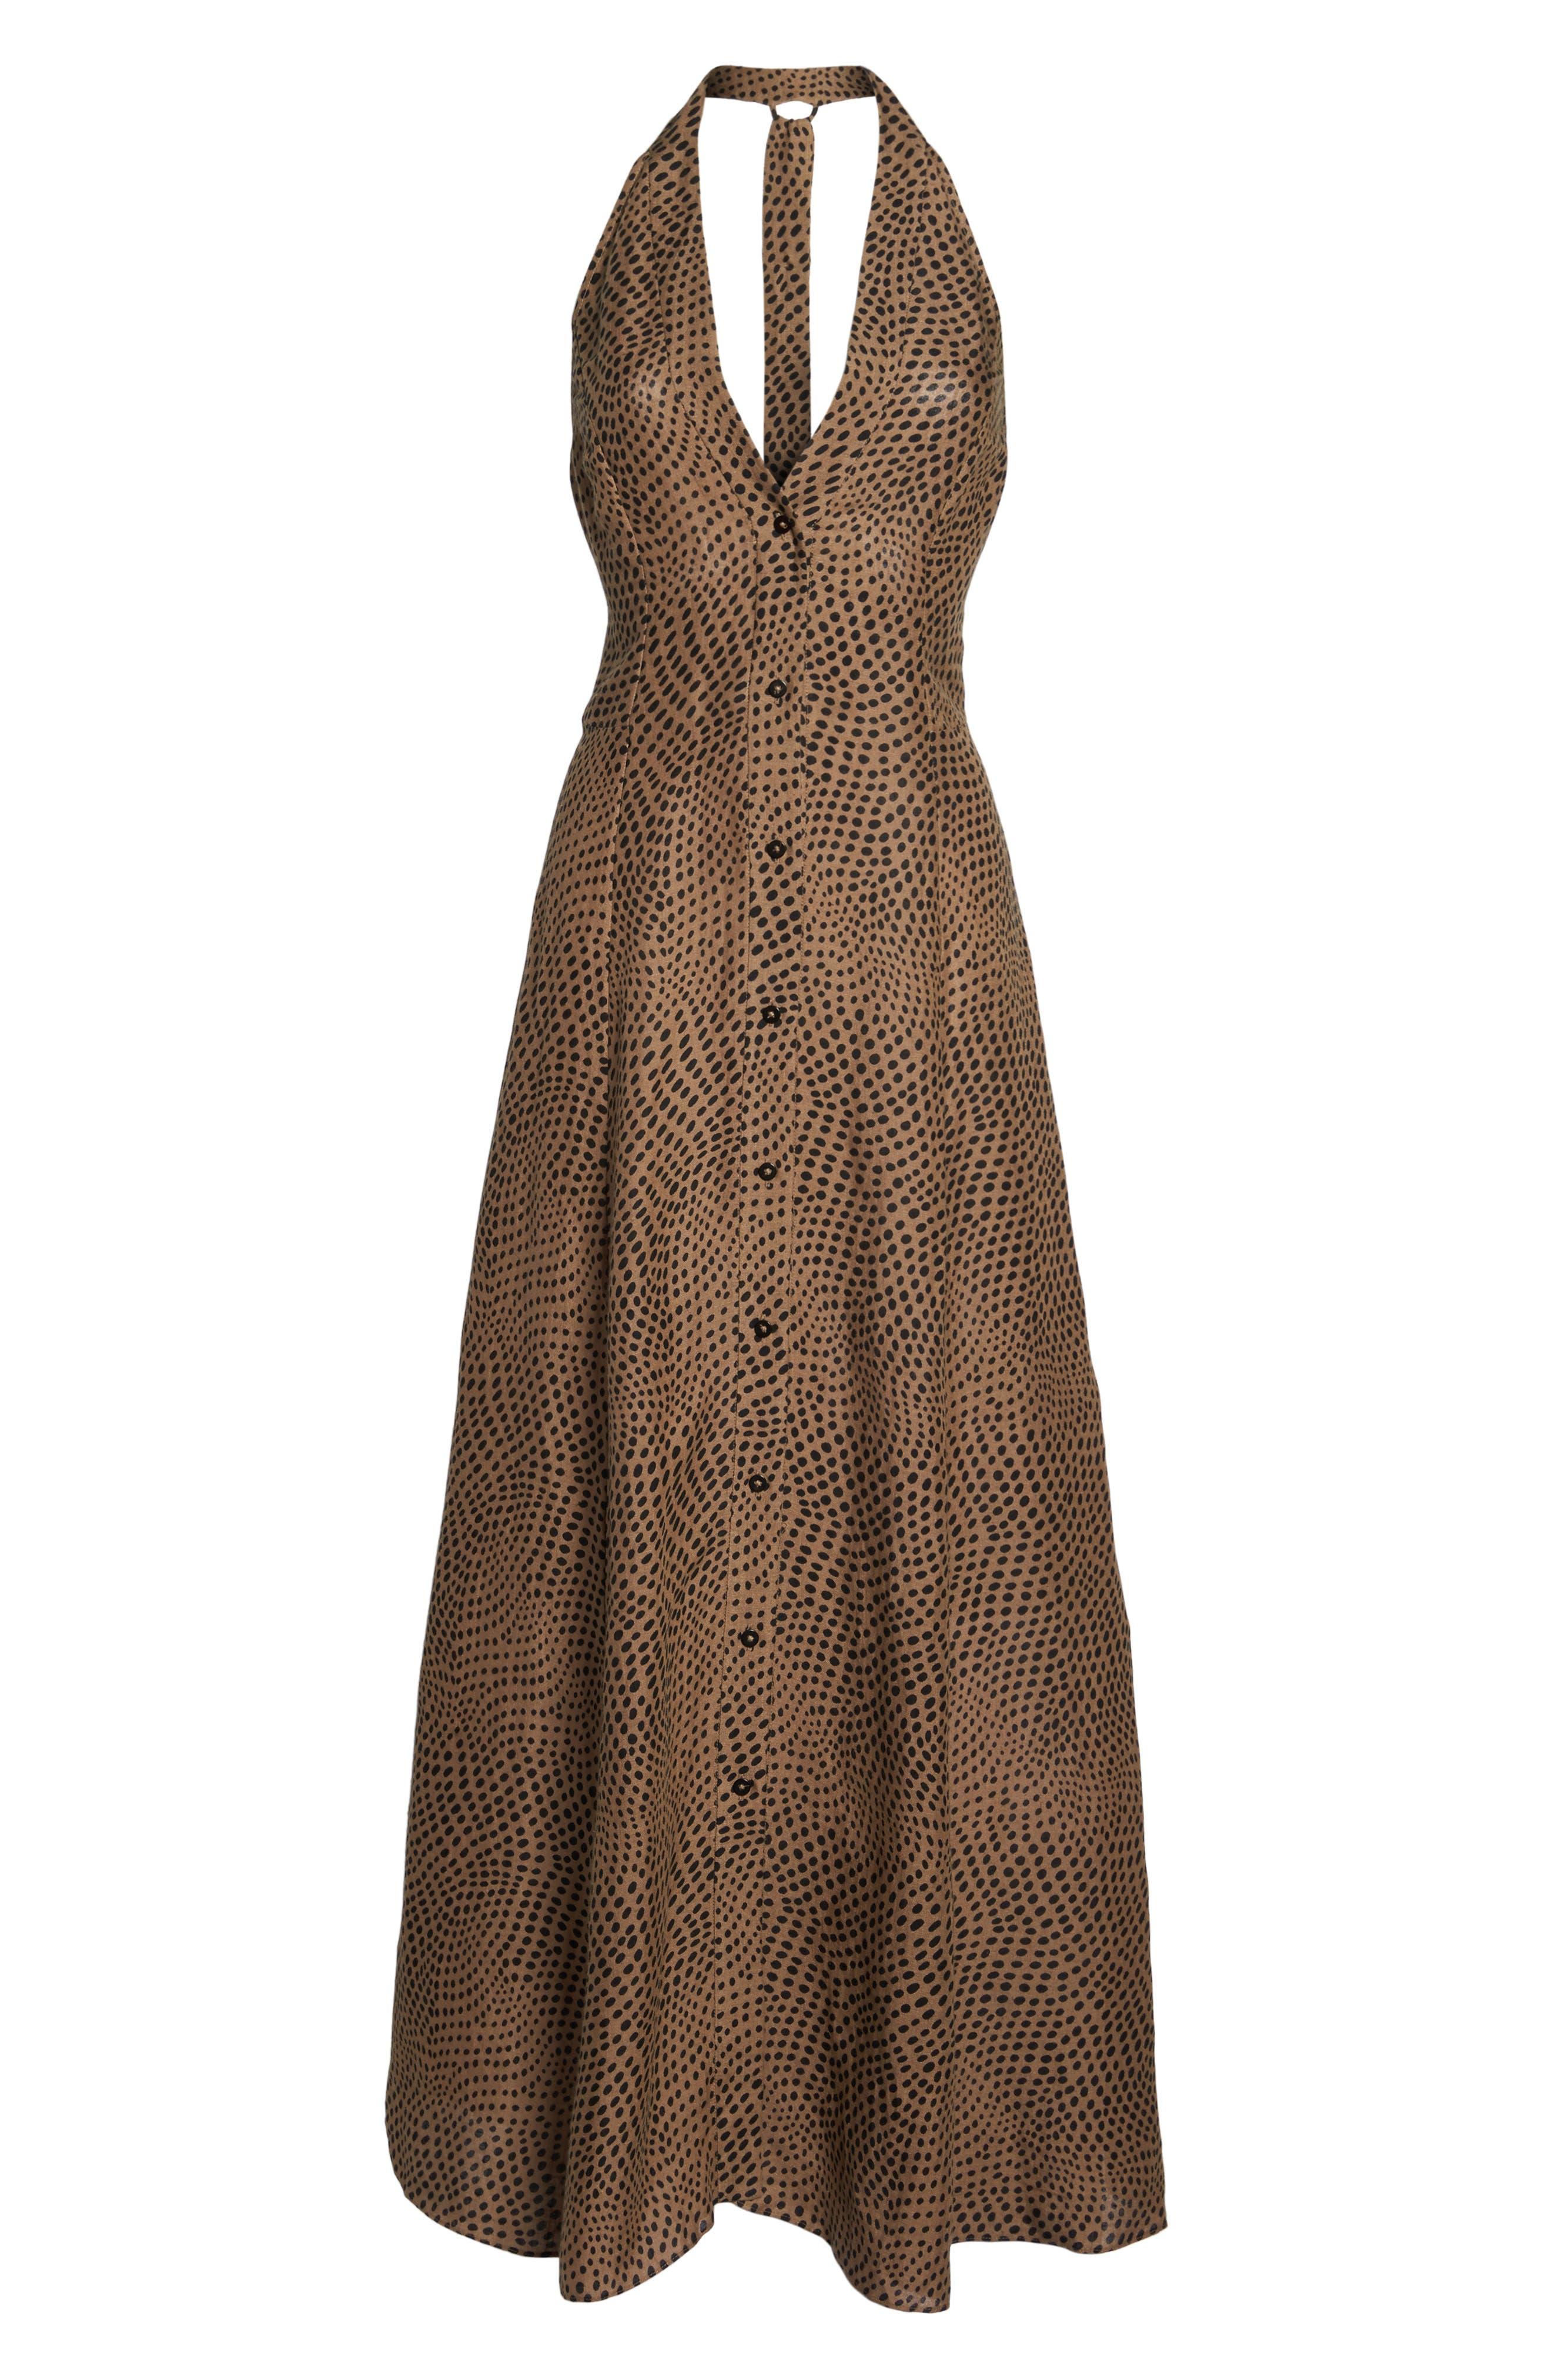 Sleeveless Cover-Up Dress,                             Alternate thumbnail 6, color,                             Easton Dot Clay